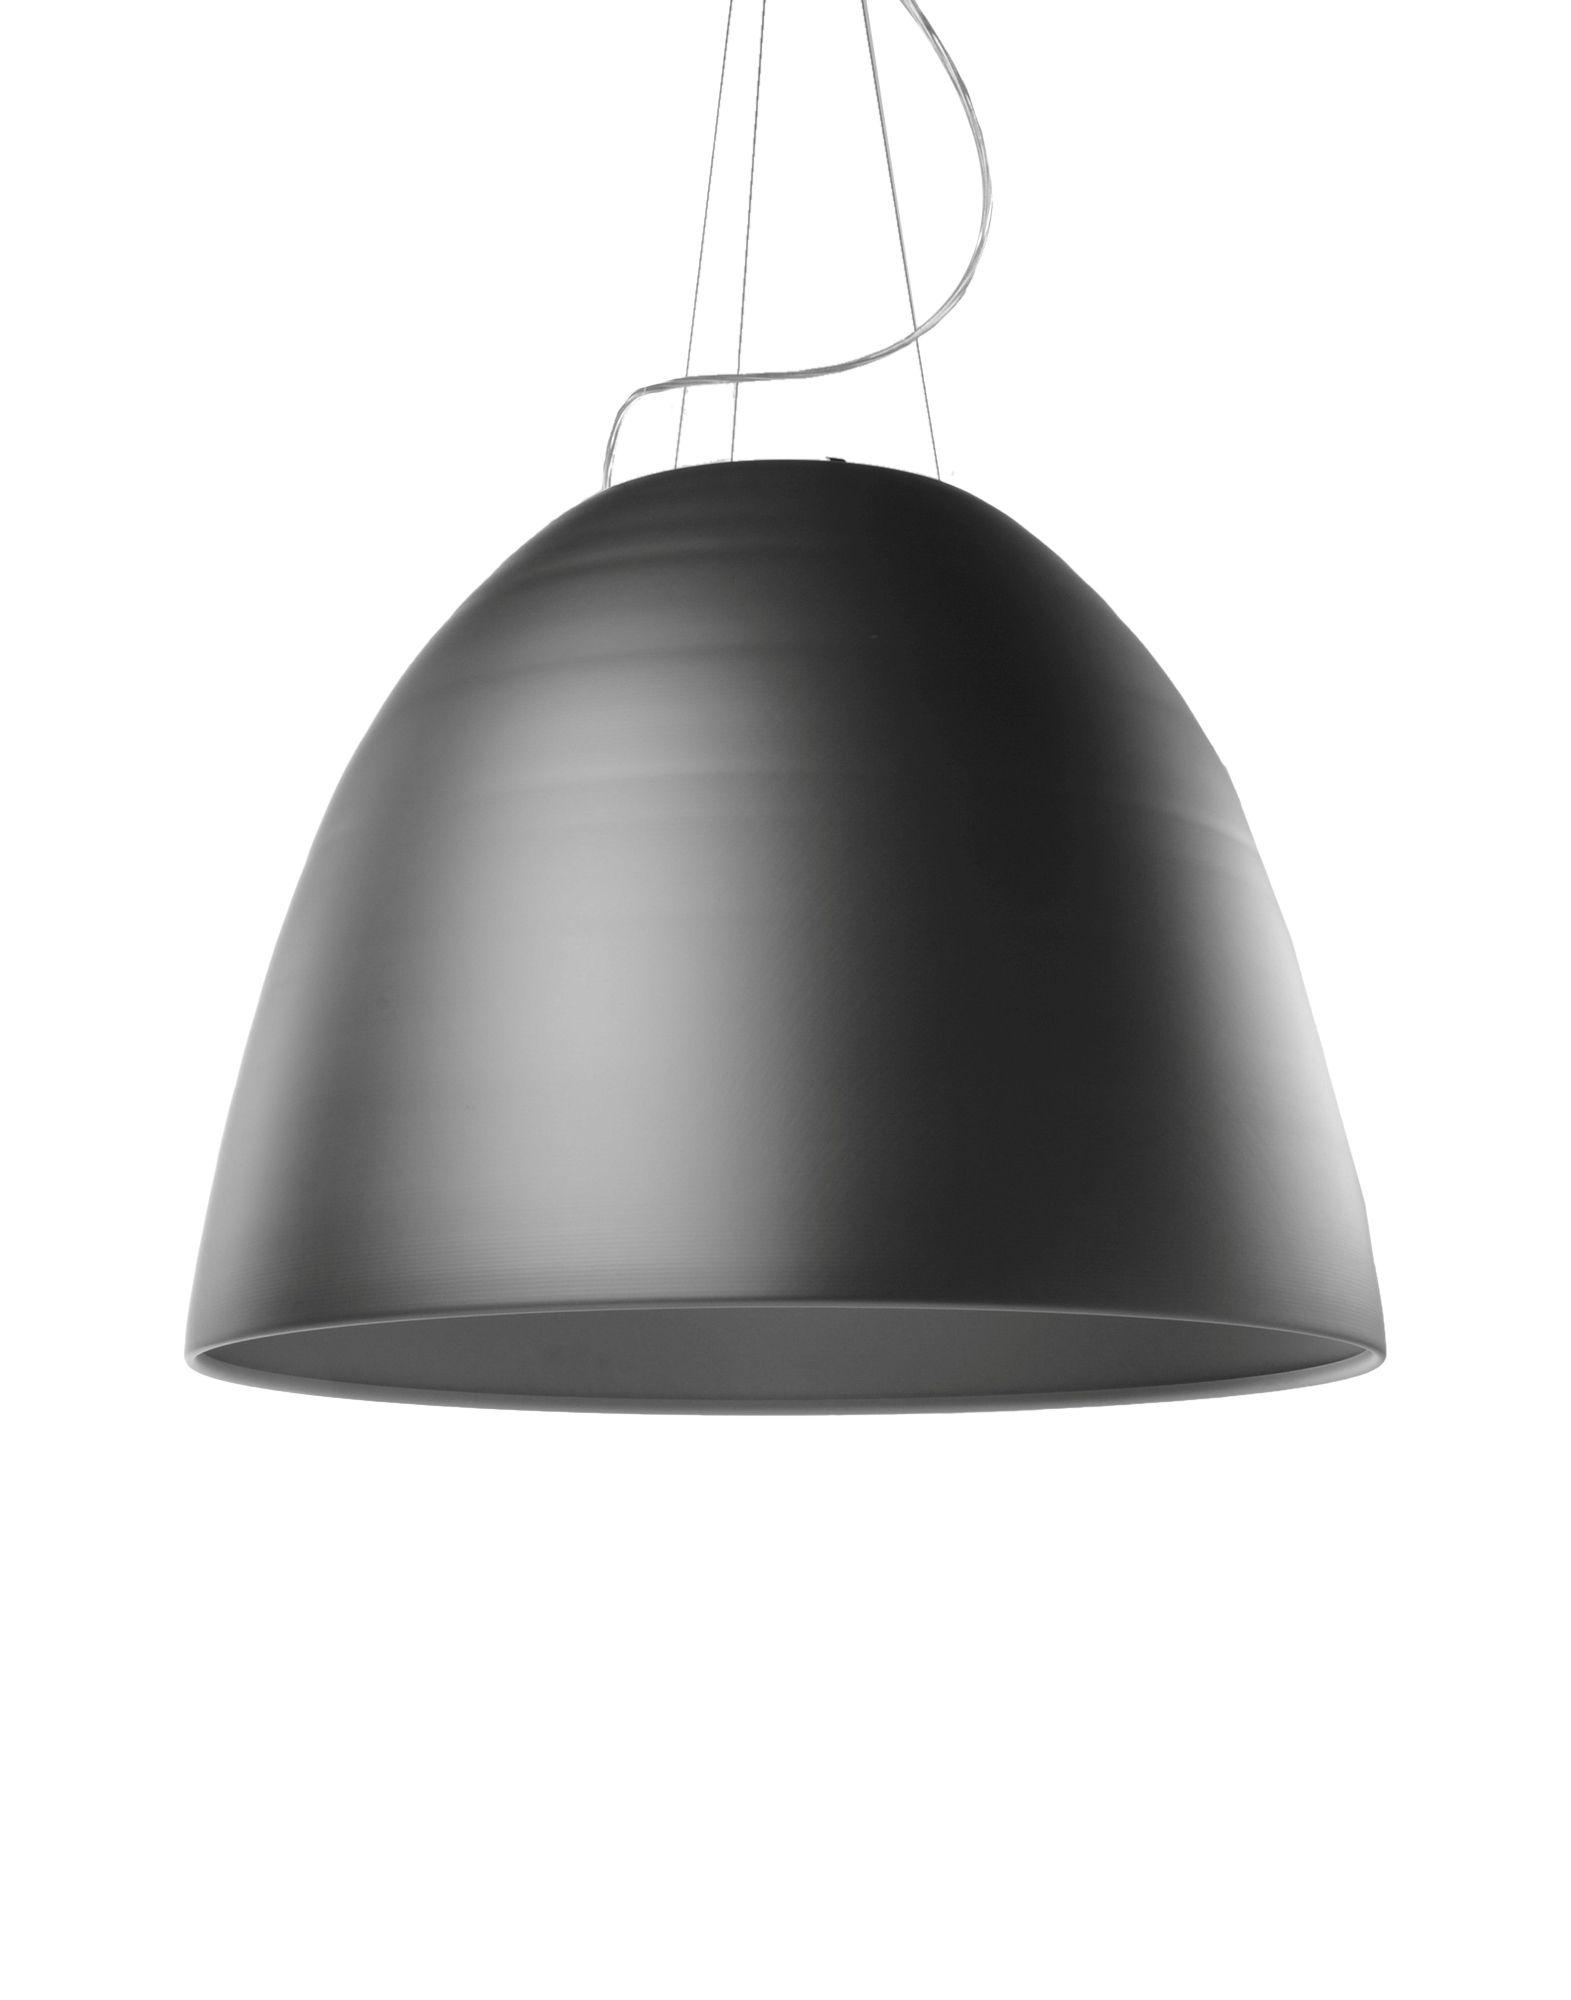 ARTEMIDE Подвесная лампа artemide светильник tolomeo sospensione decentrata